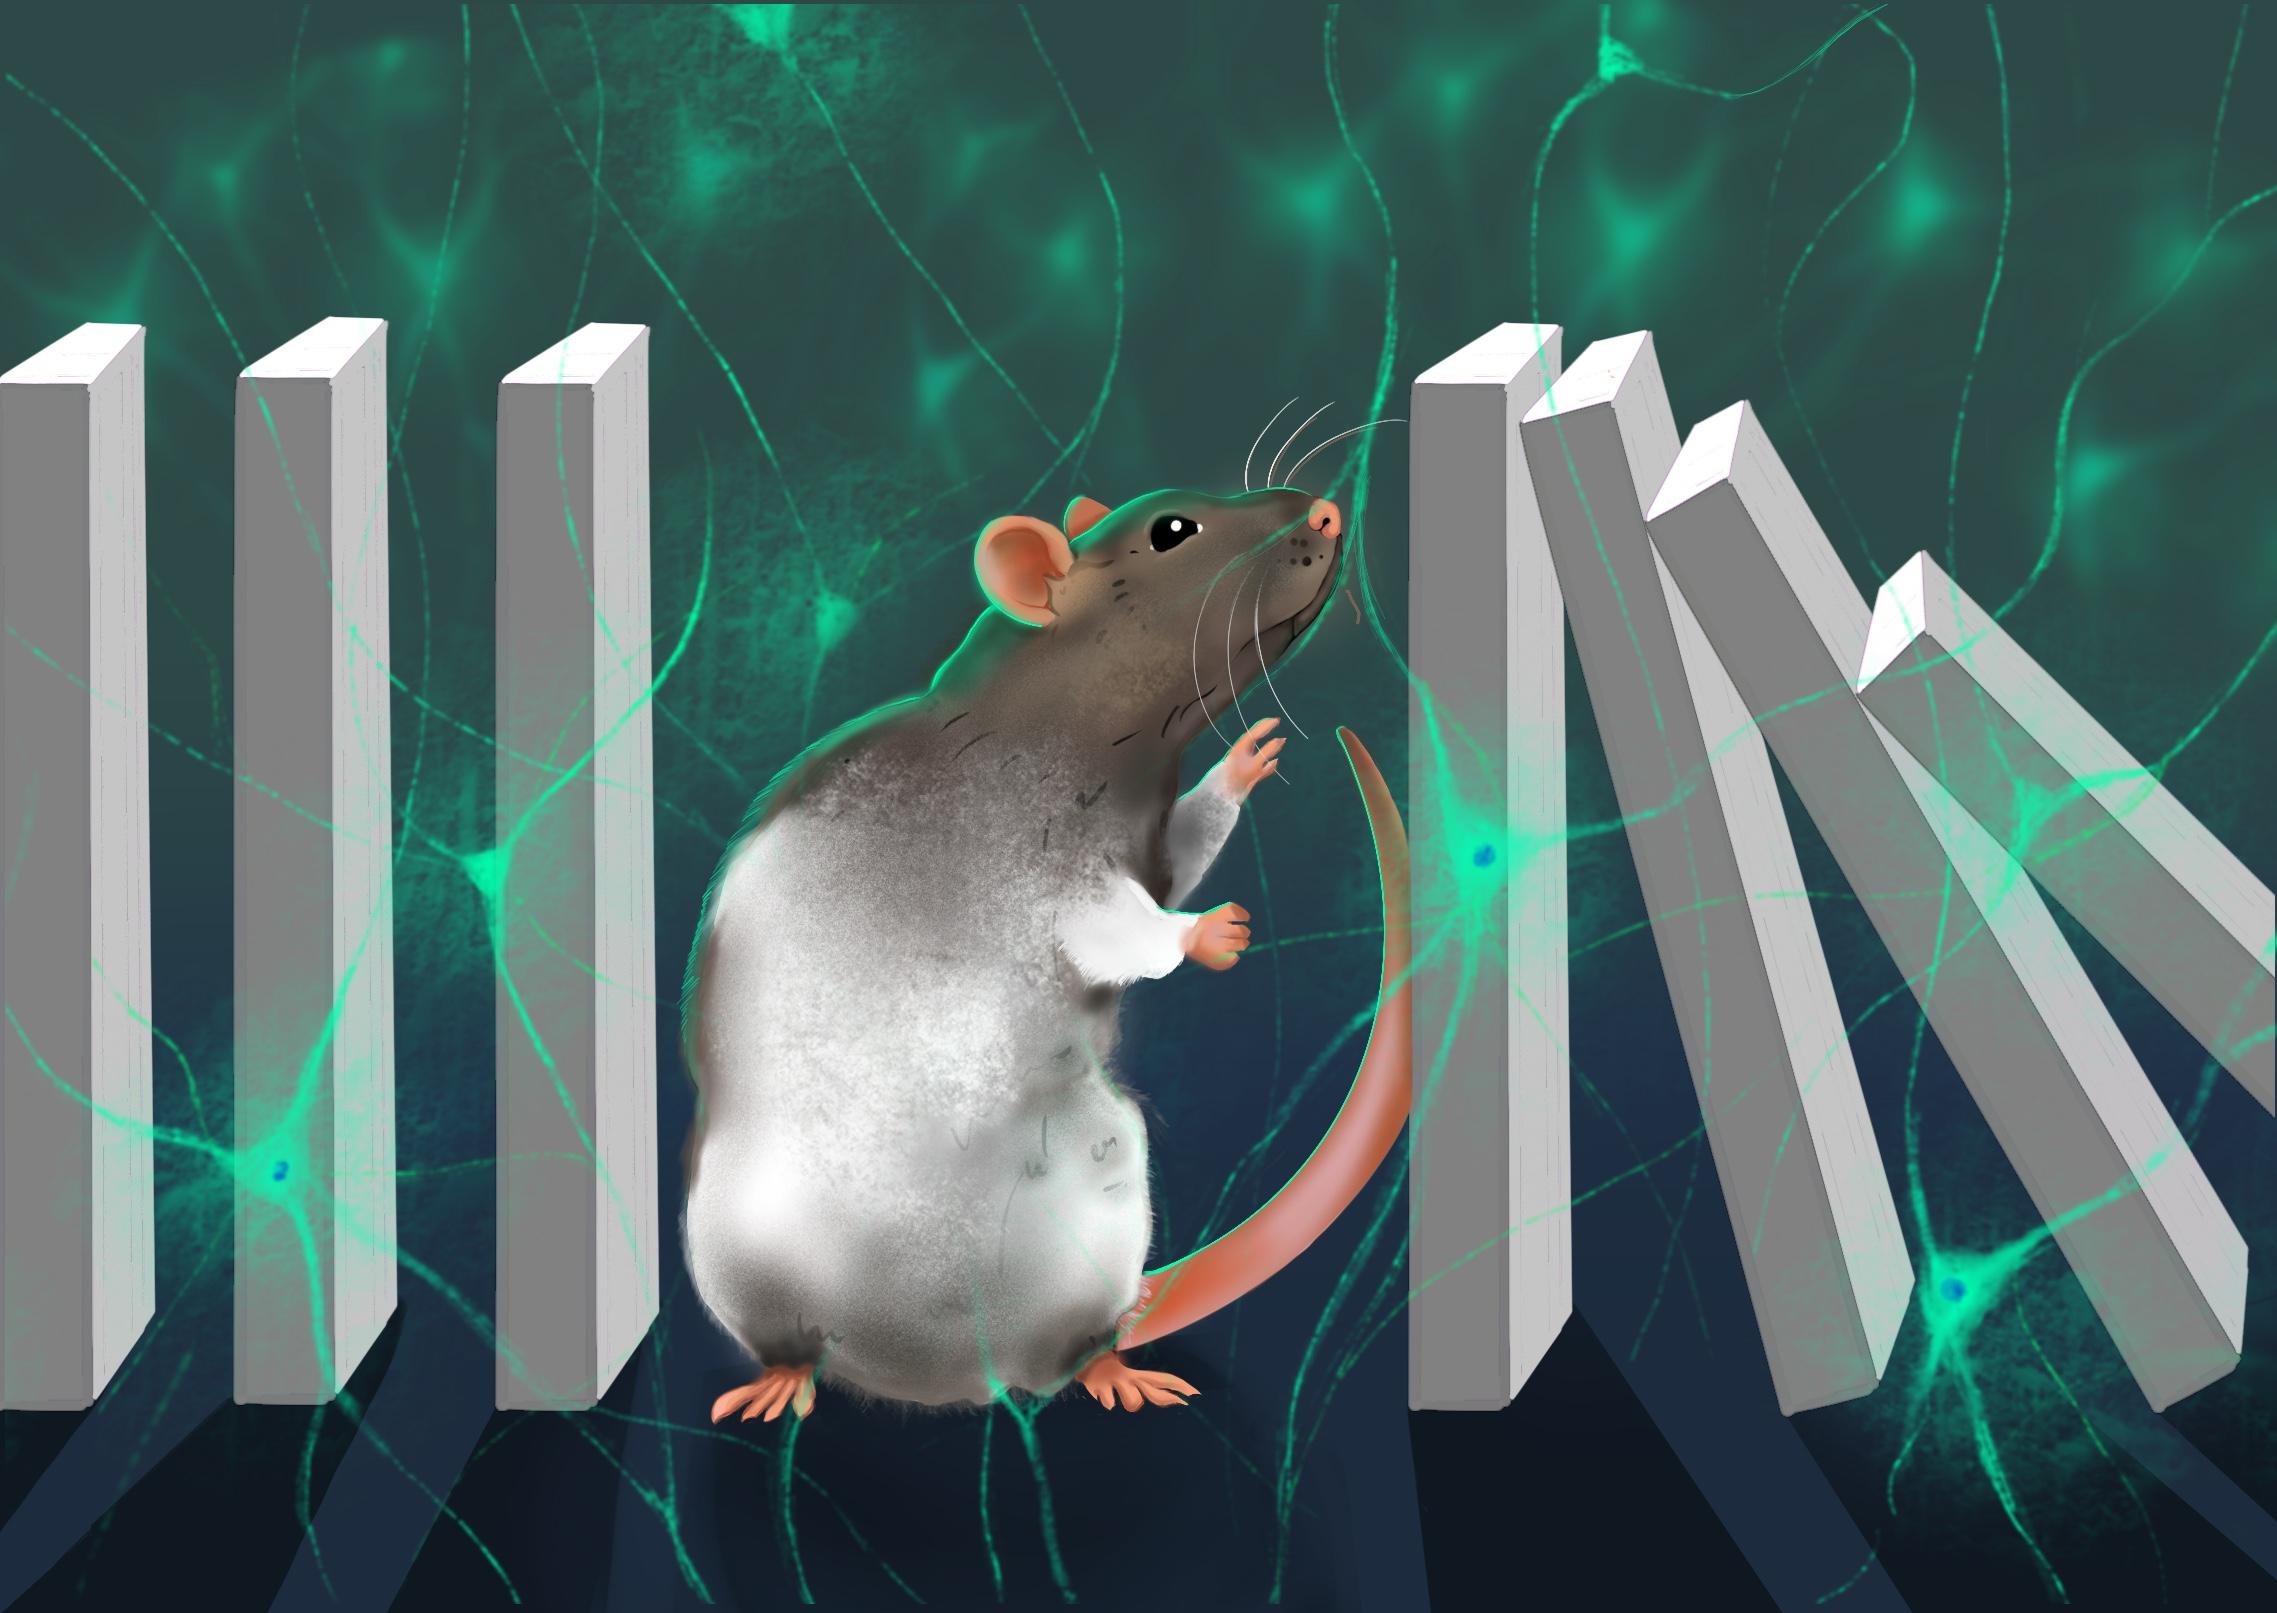 Sabariego et al. 2019 - Neuron